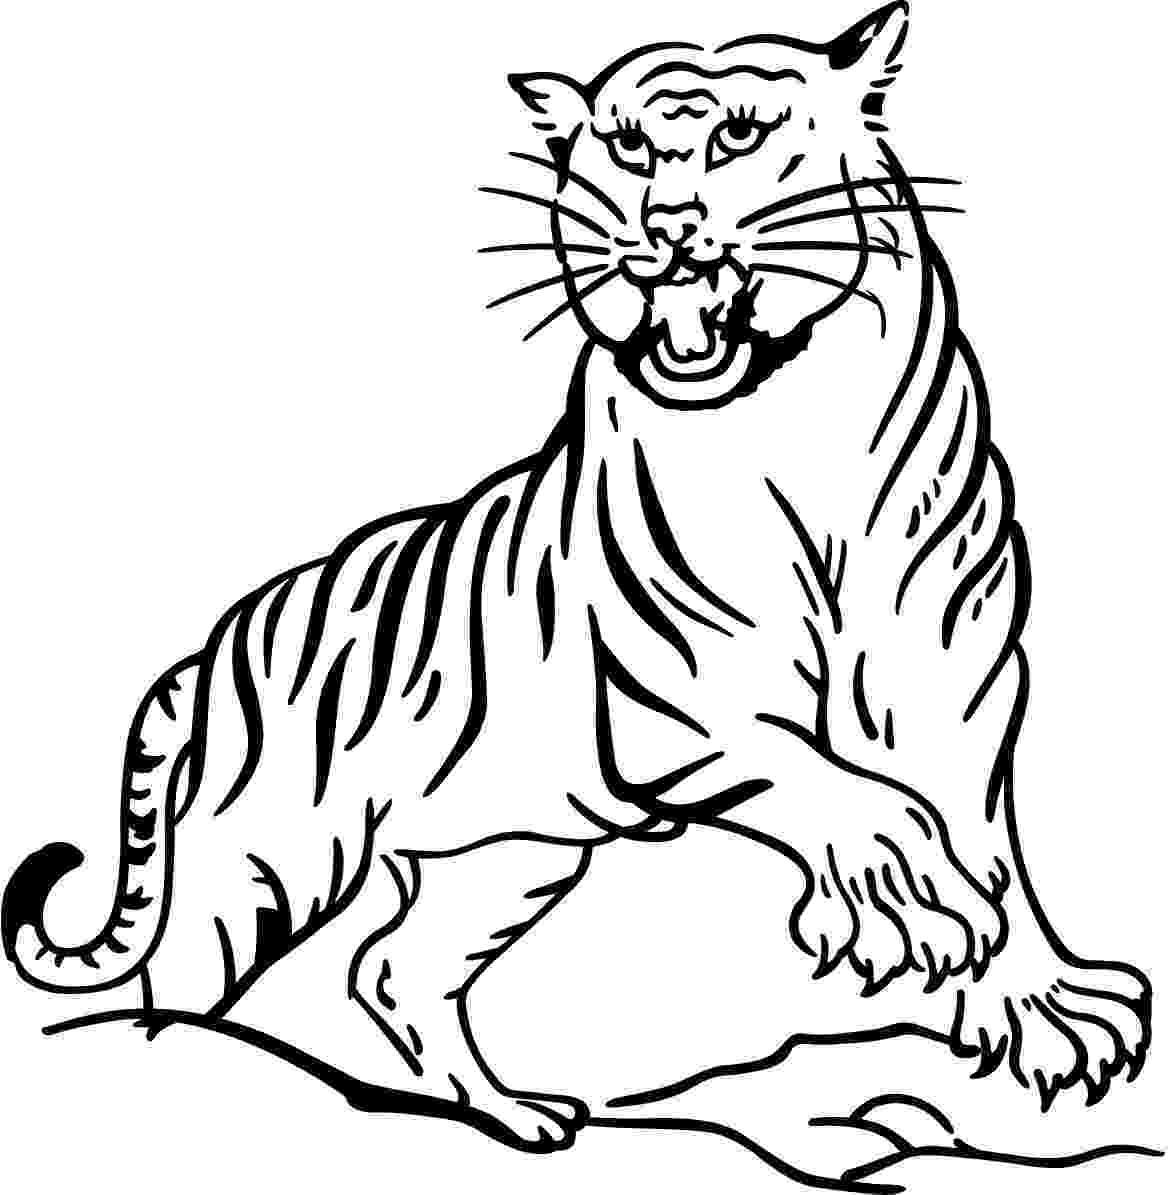 coloring page tiger free printable tiger coloring pages for kids page tiger coloring 1 2